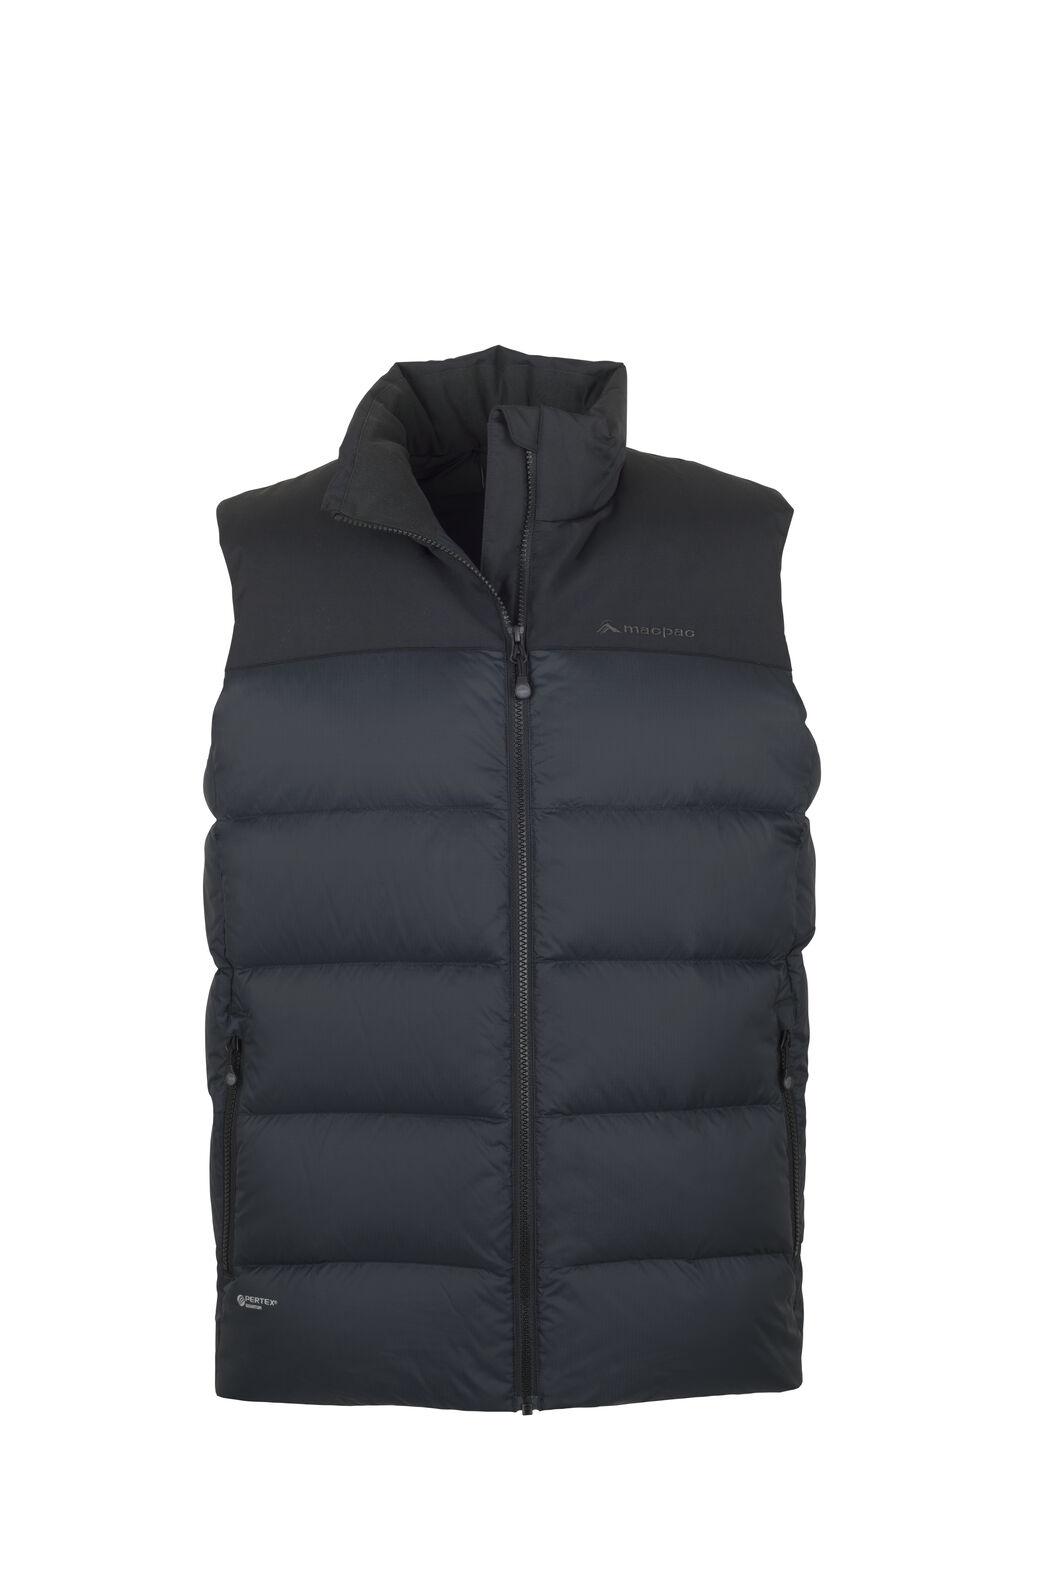 Macpac Ember Down Vest — Men's, Black, hi-res